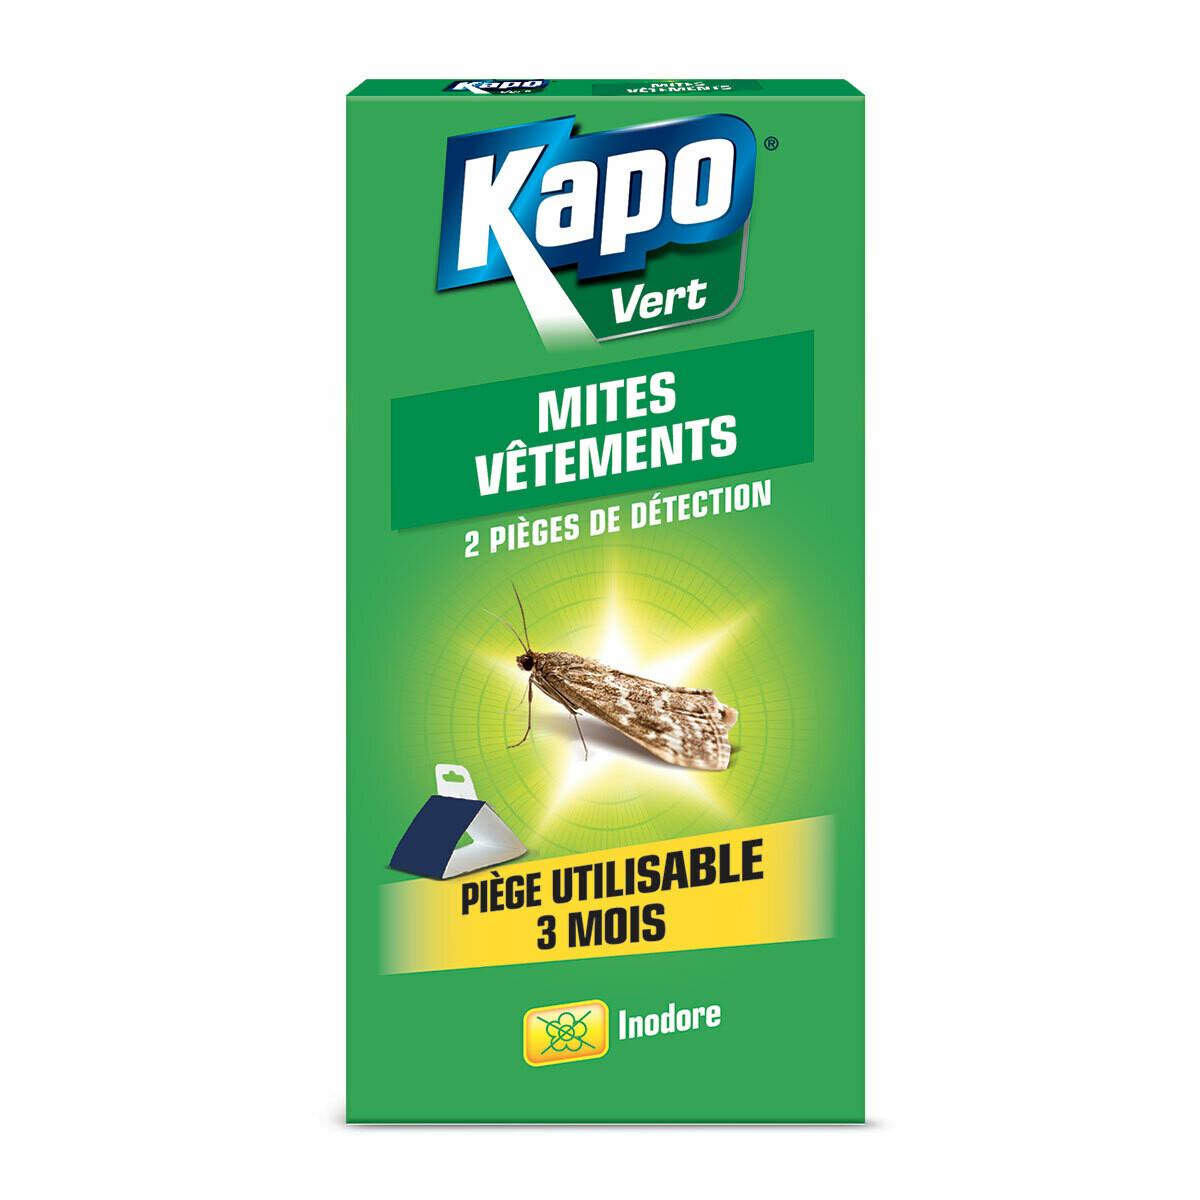 Kapo Kledingmotten vallen